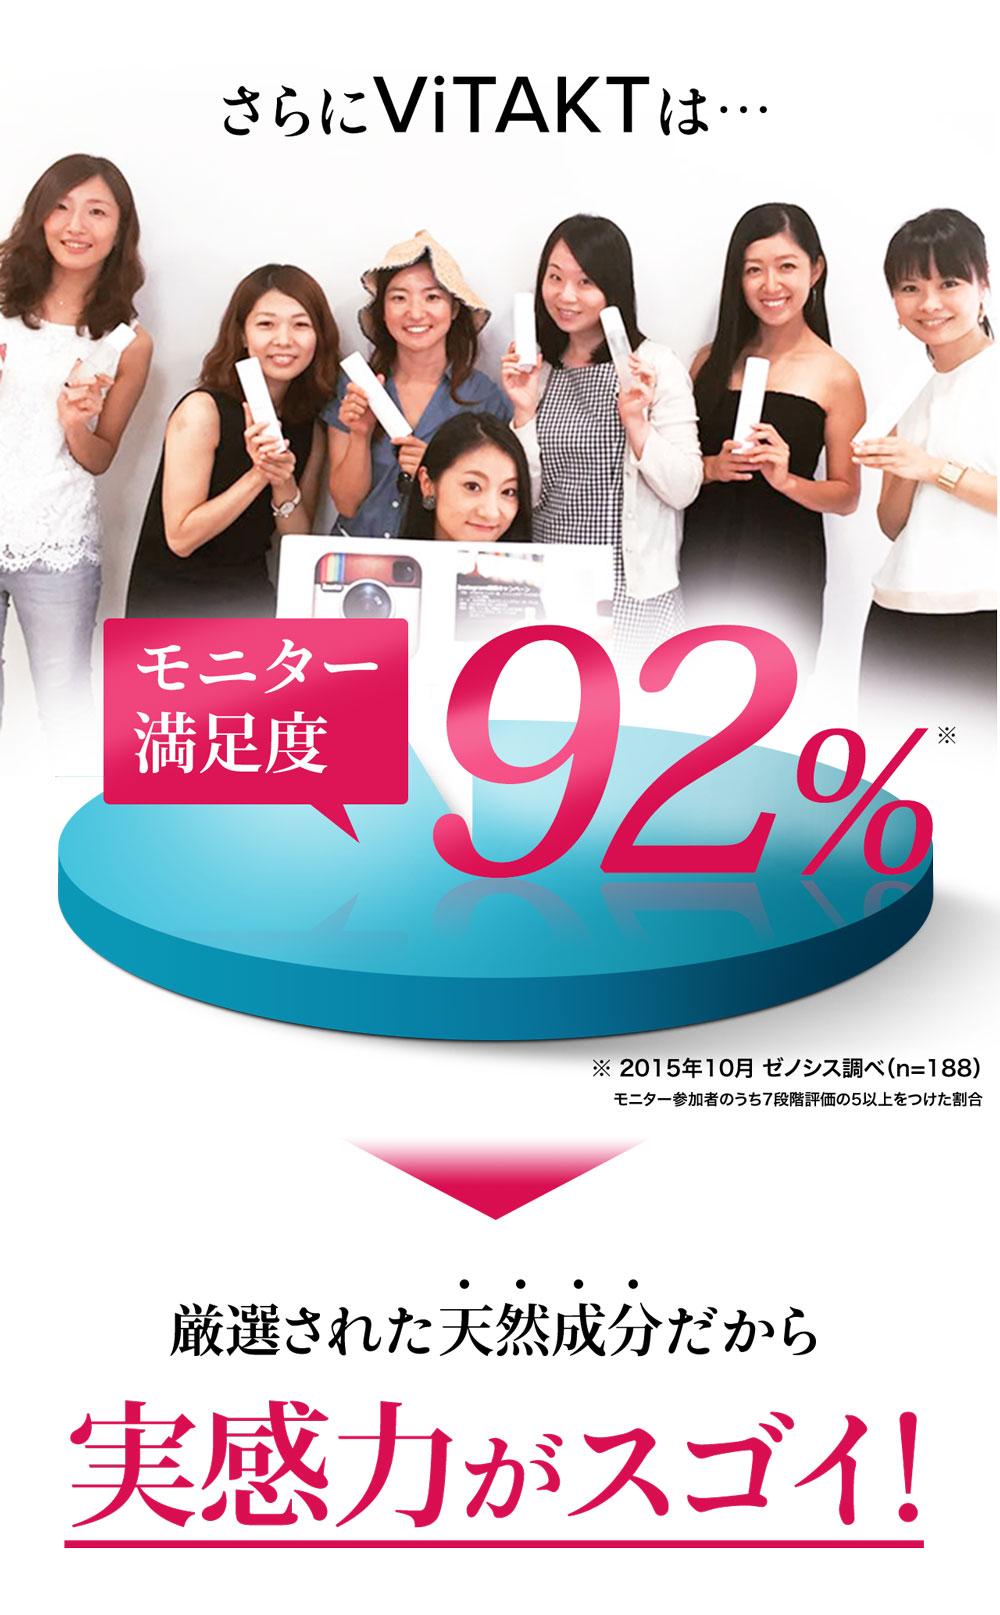 vitakt_lp_satisfaction_rate.jpg